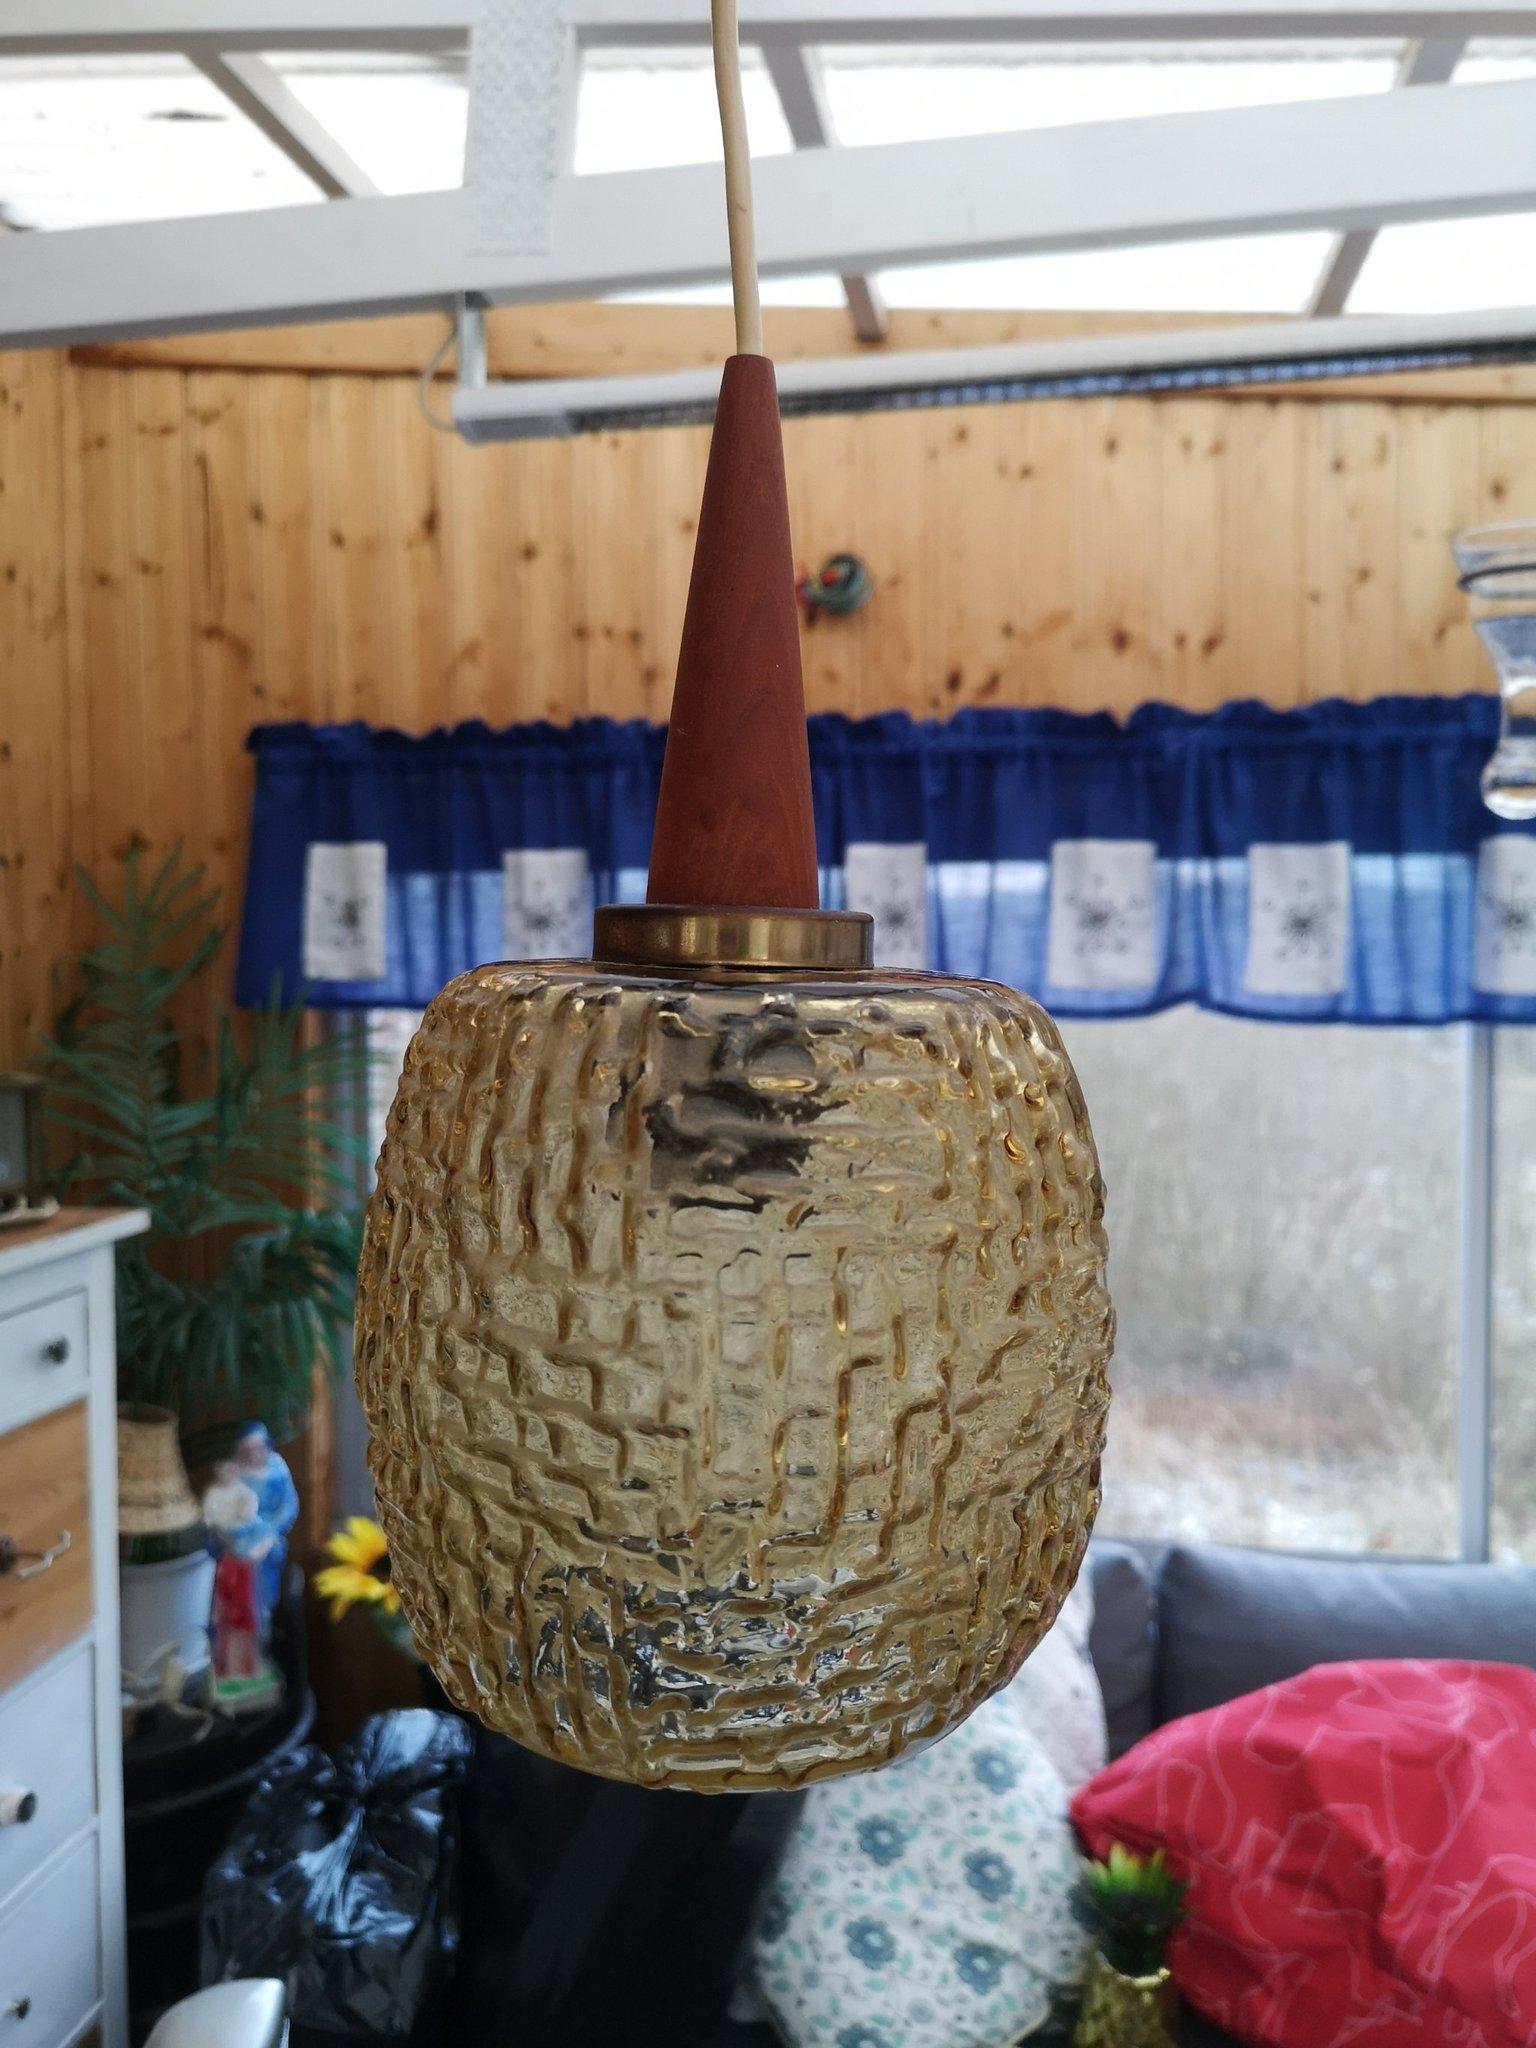 Retro Taklampa Lampa i glas & teak 1960 tal